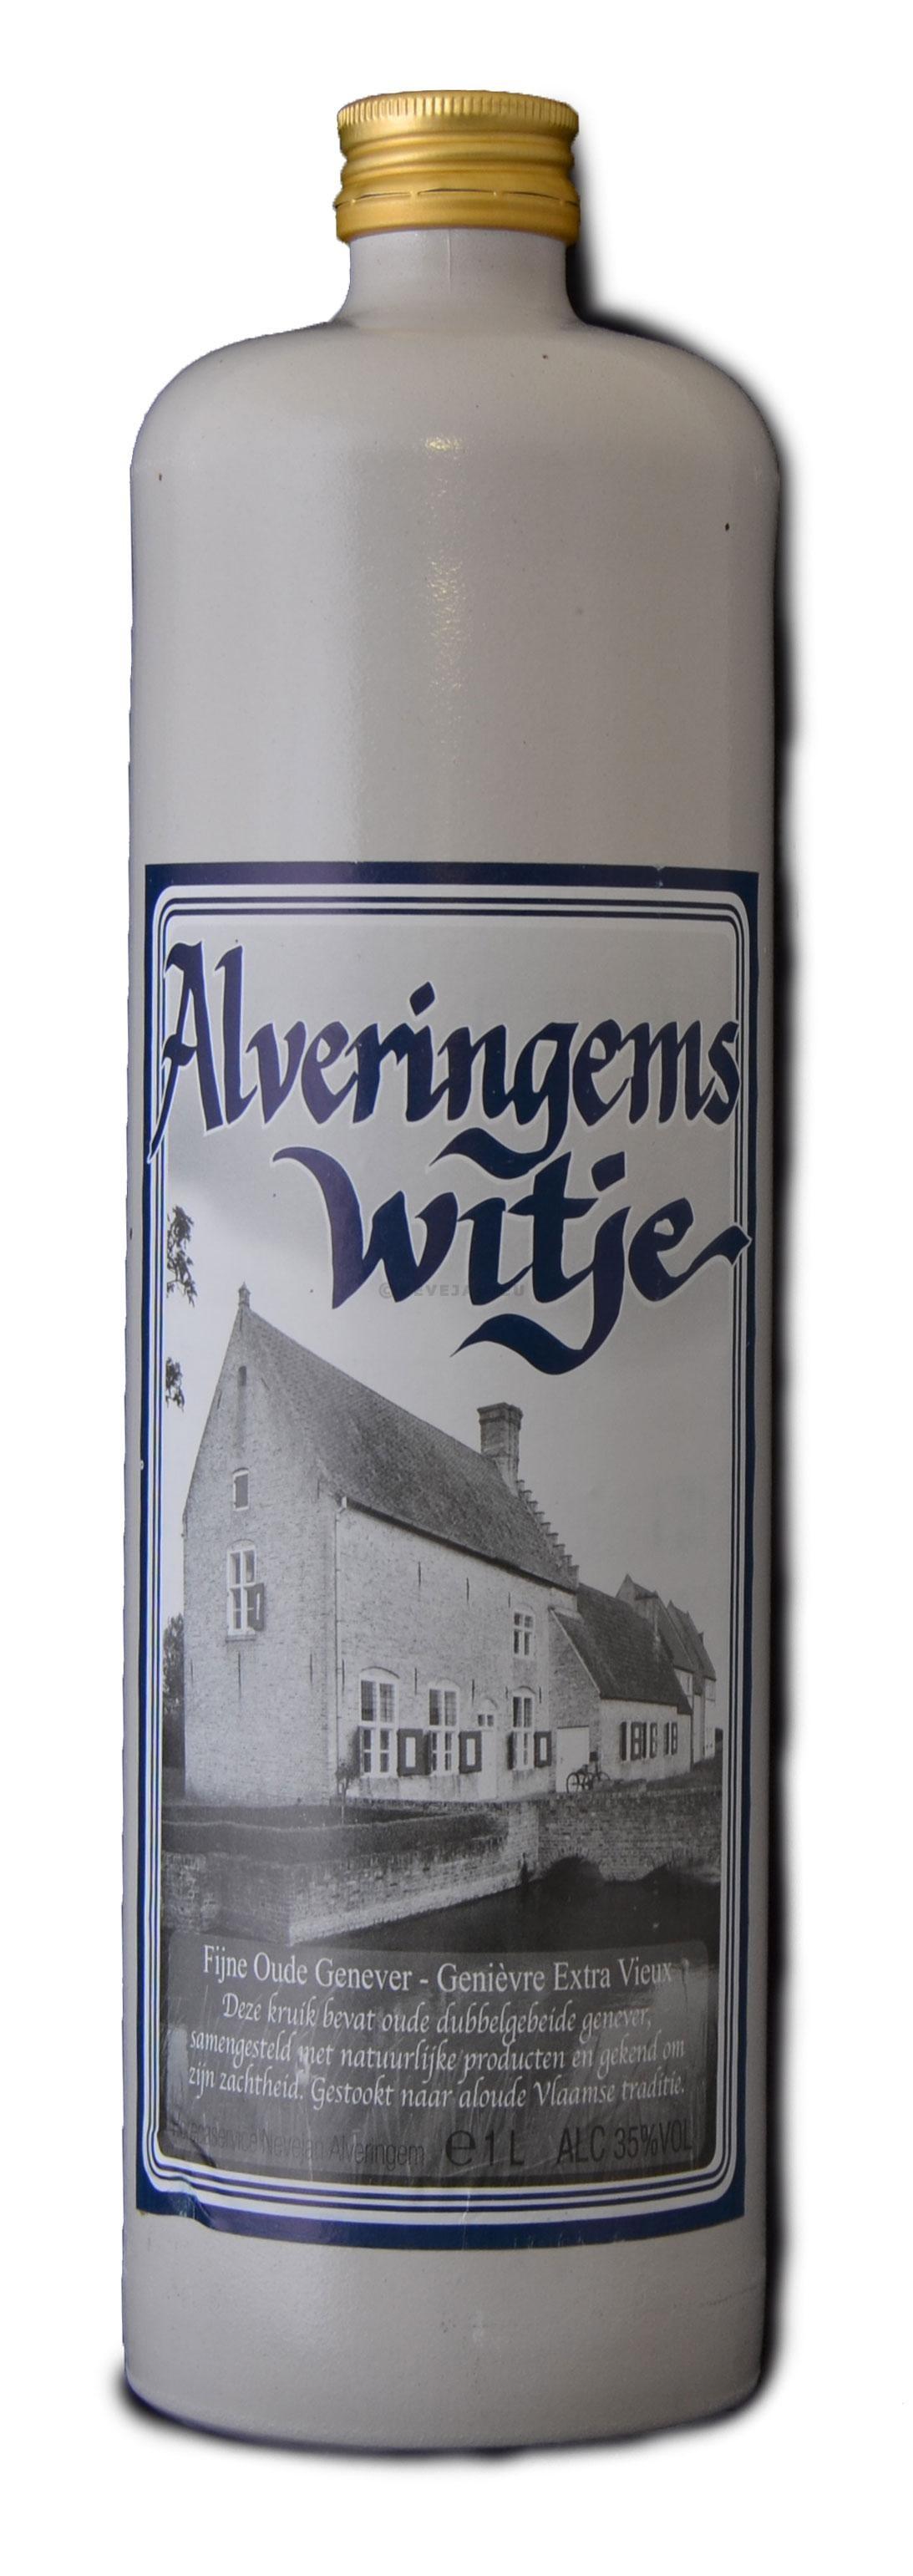 Jenever Alveringems Witje 1L 35% stenen kruik